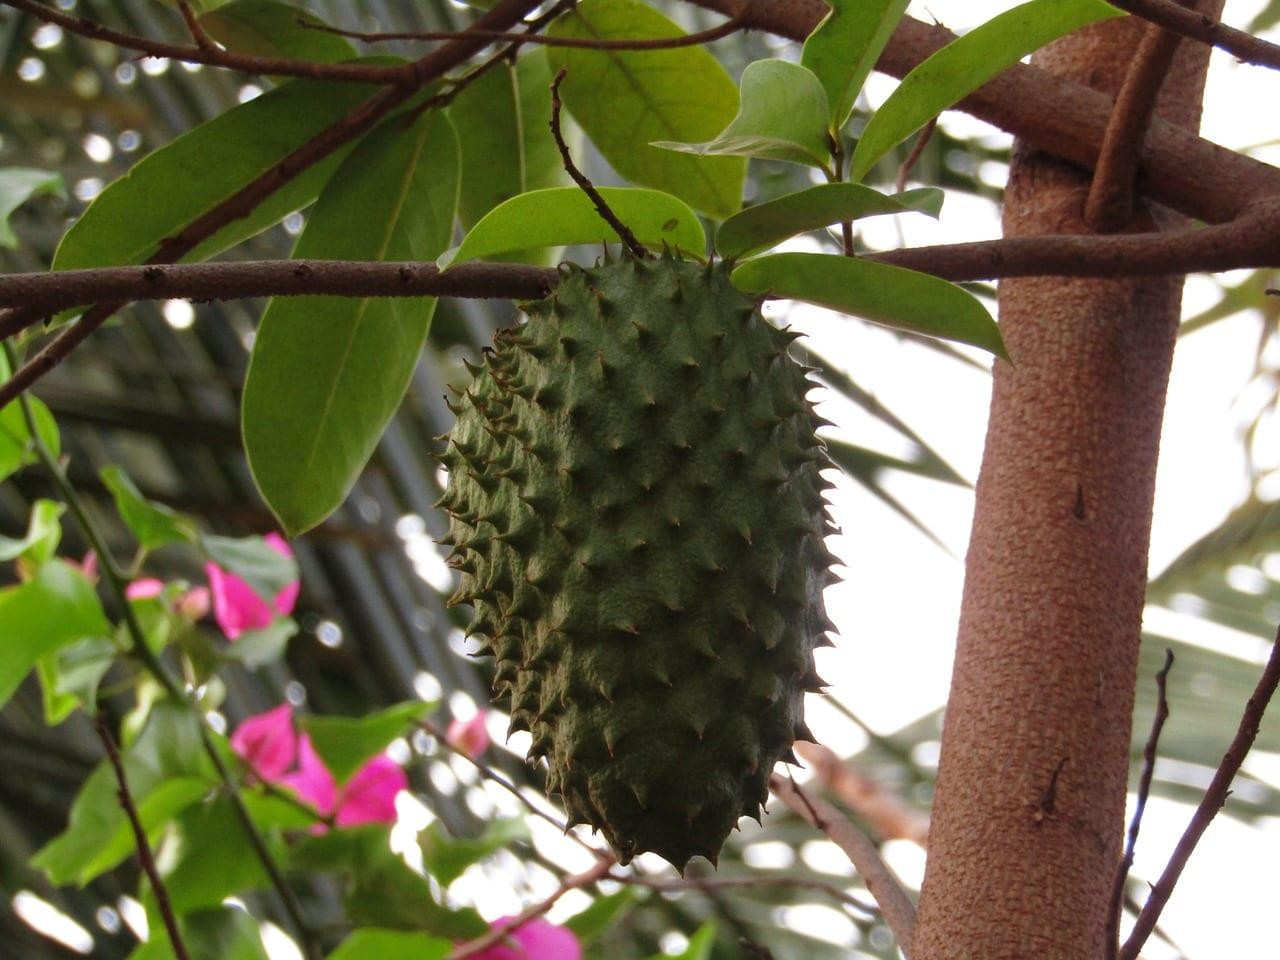 Fruits in Ghana - Soursop